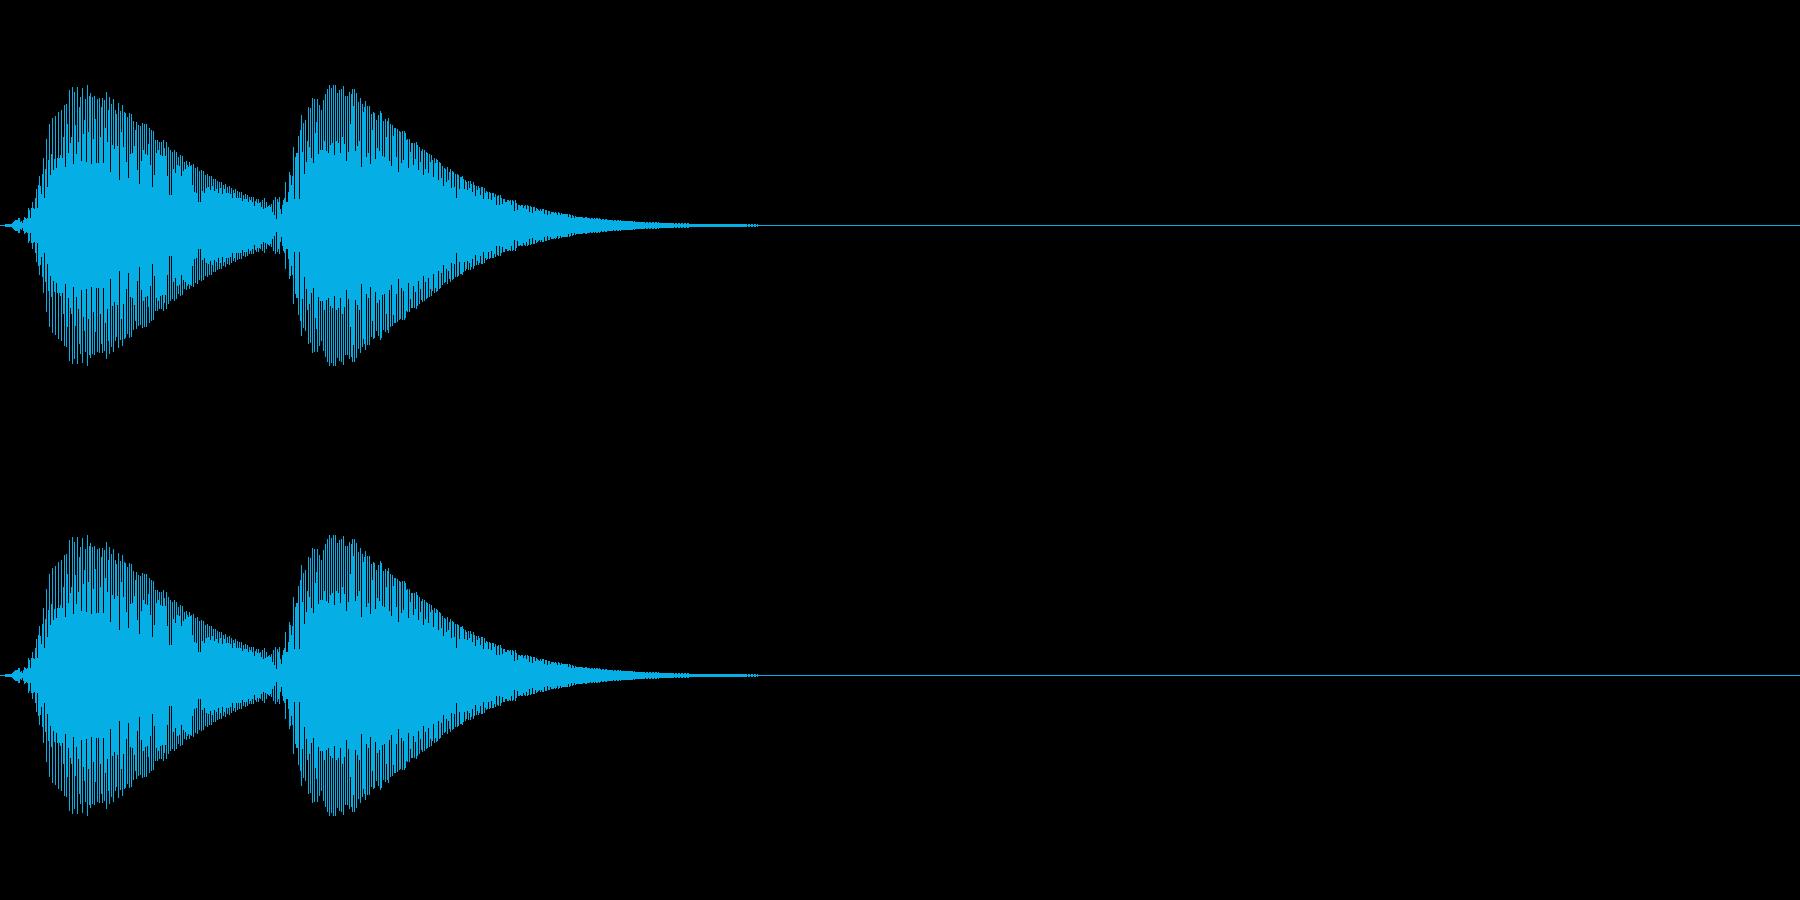 KANTアイキャッチ206231の再生済みの波形